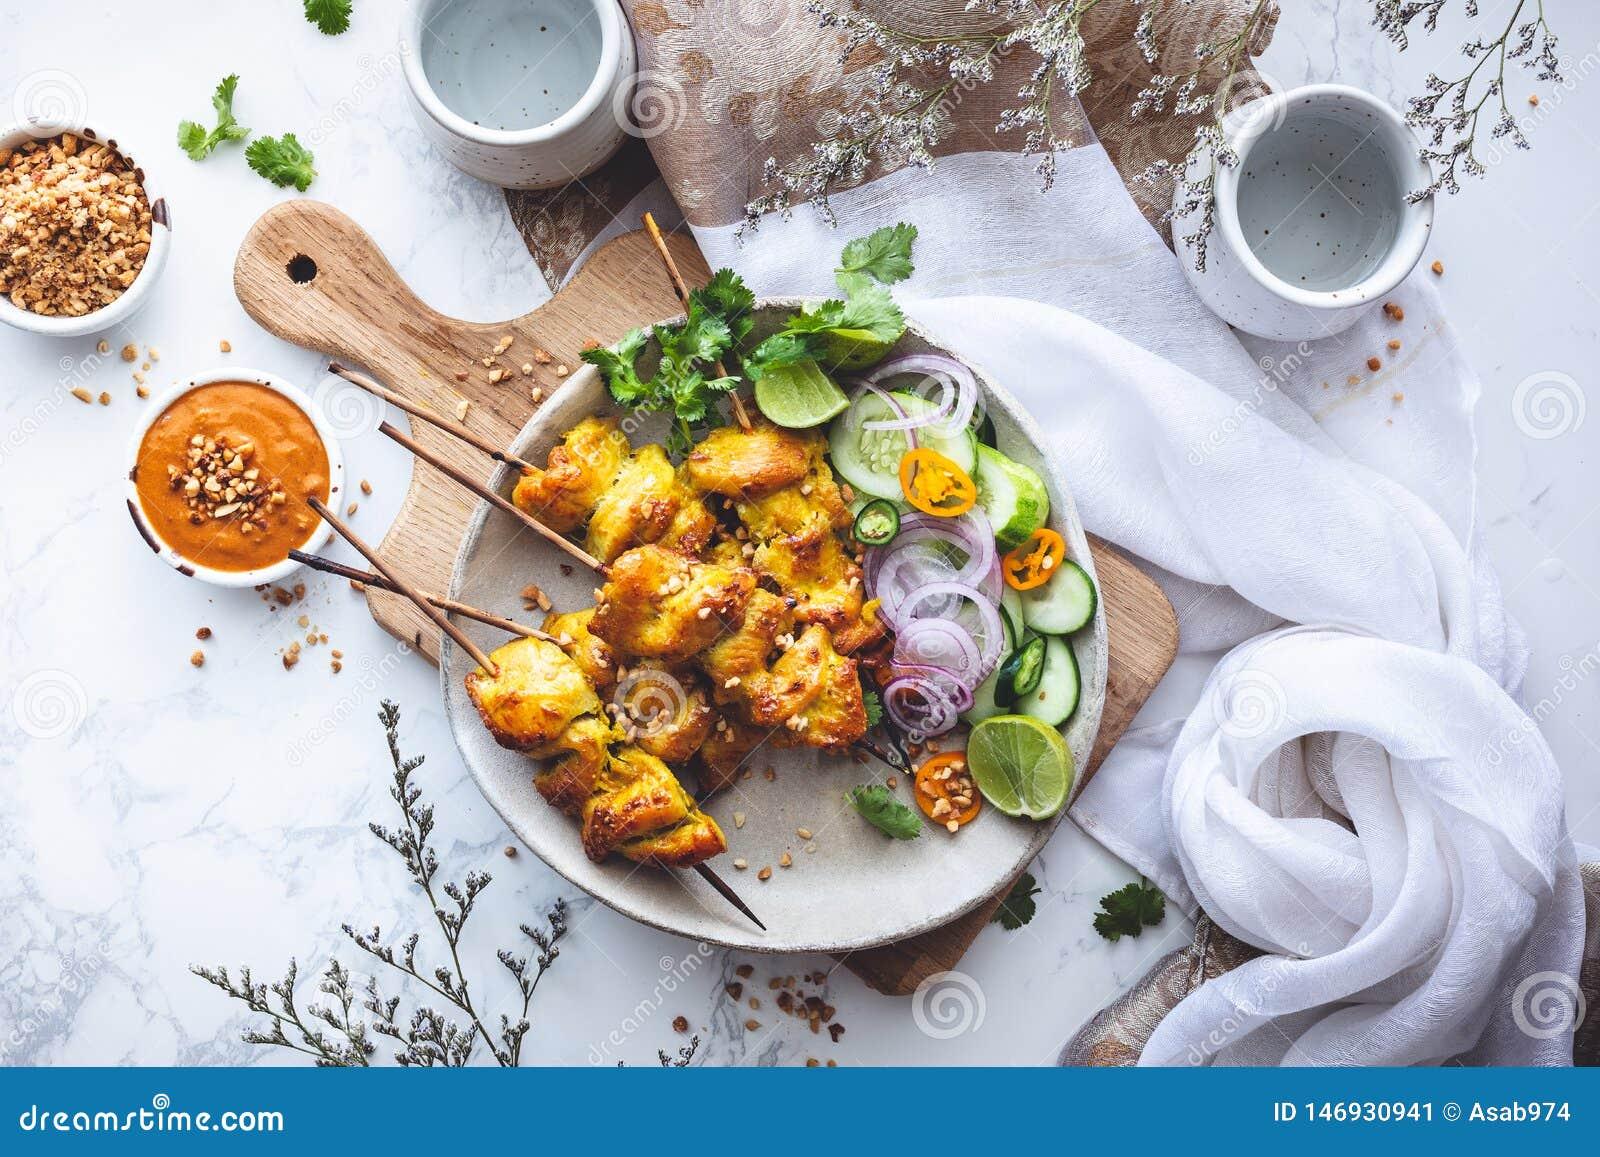 Satay Sauce or Peanuts Sauce for Chicken Satay